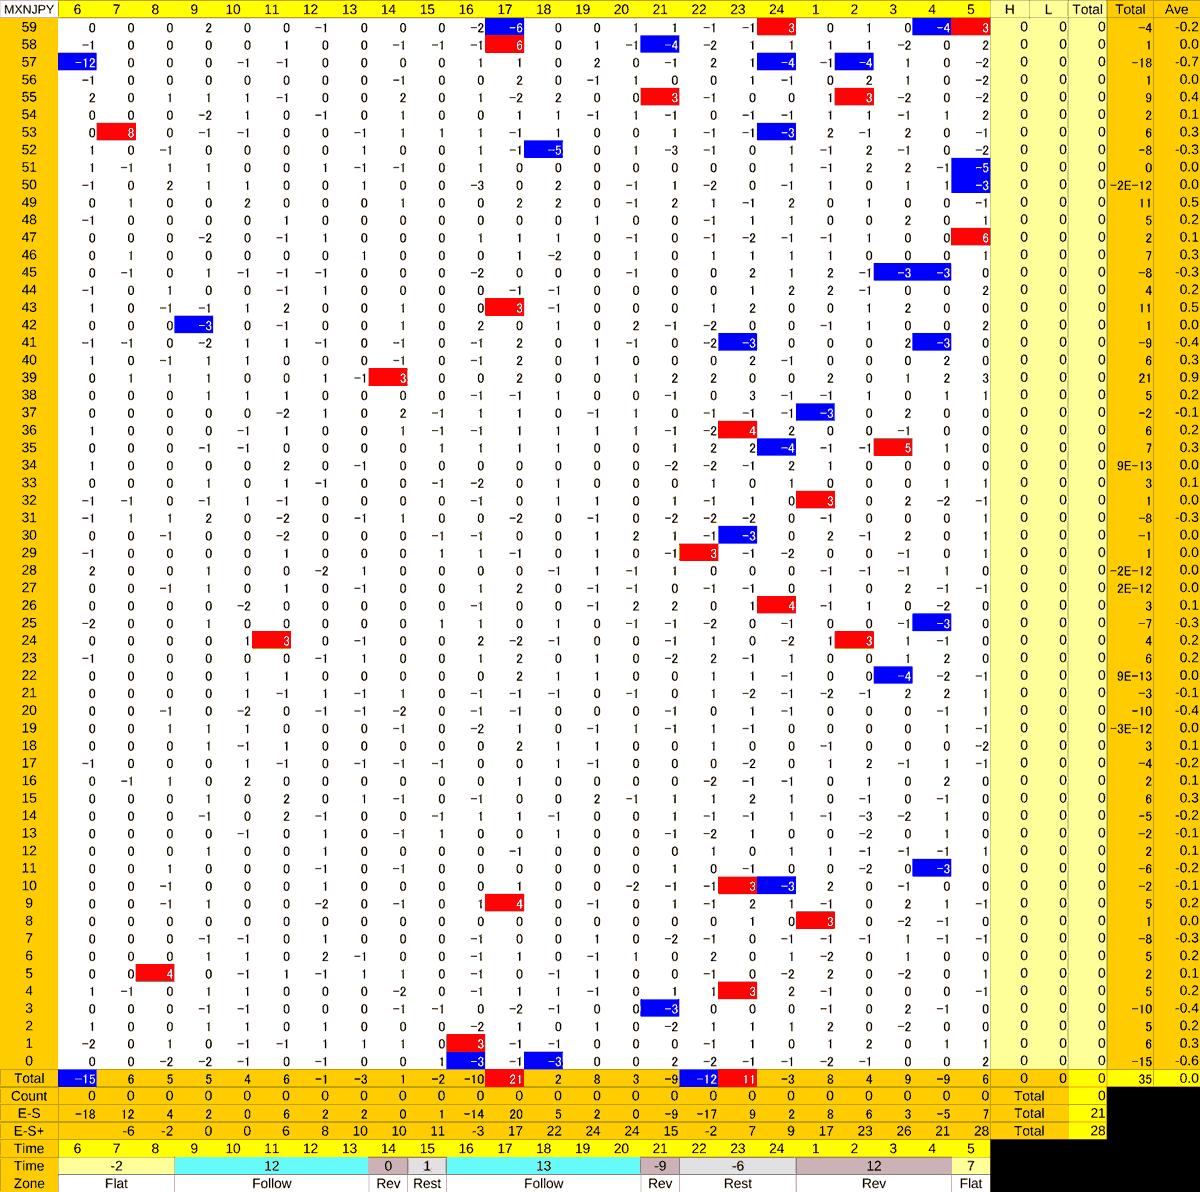 20210114_HS(3)MXNJPY